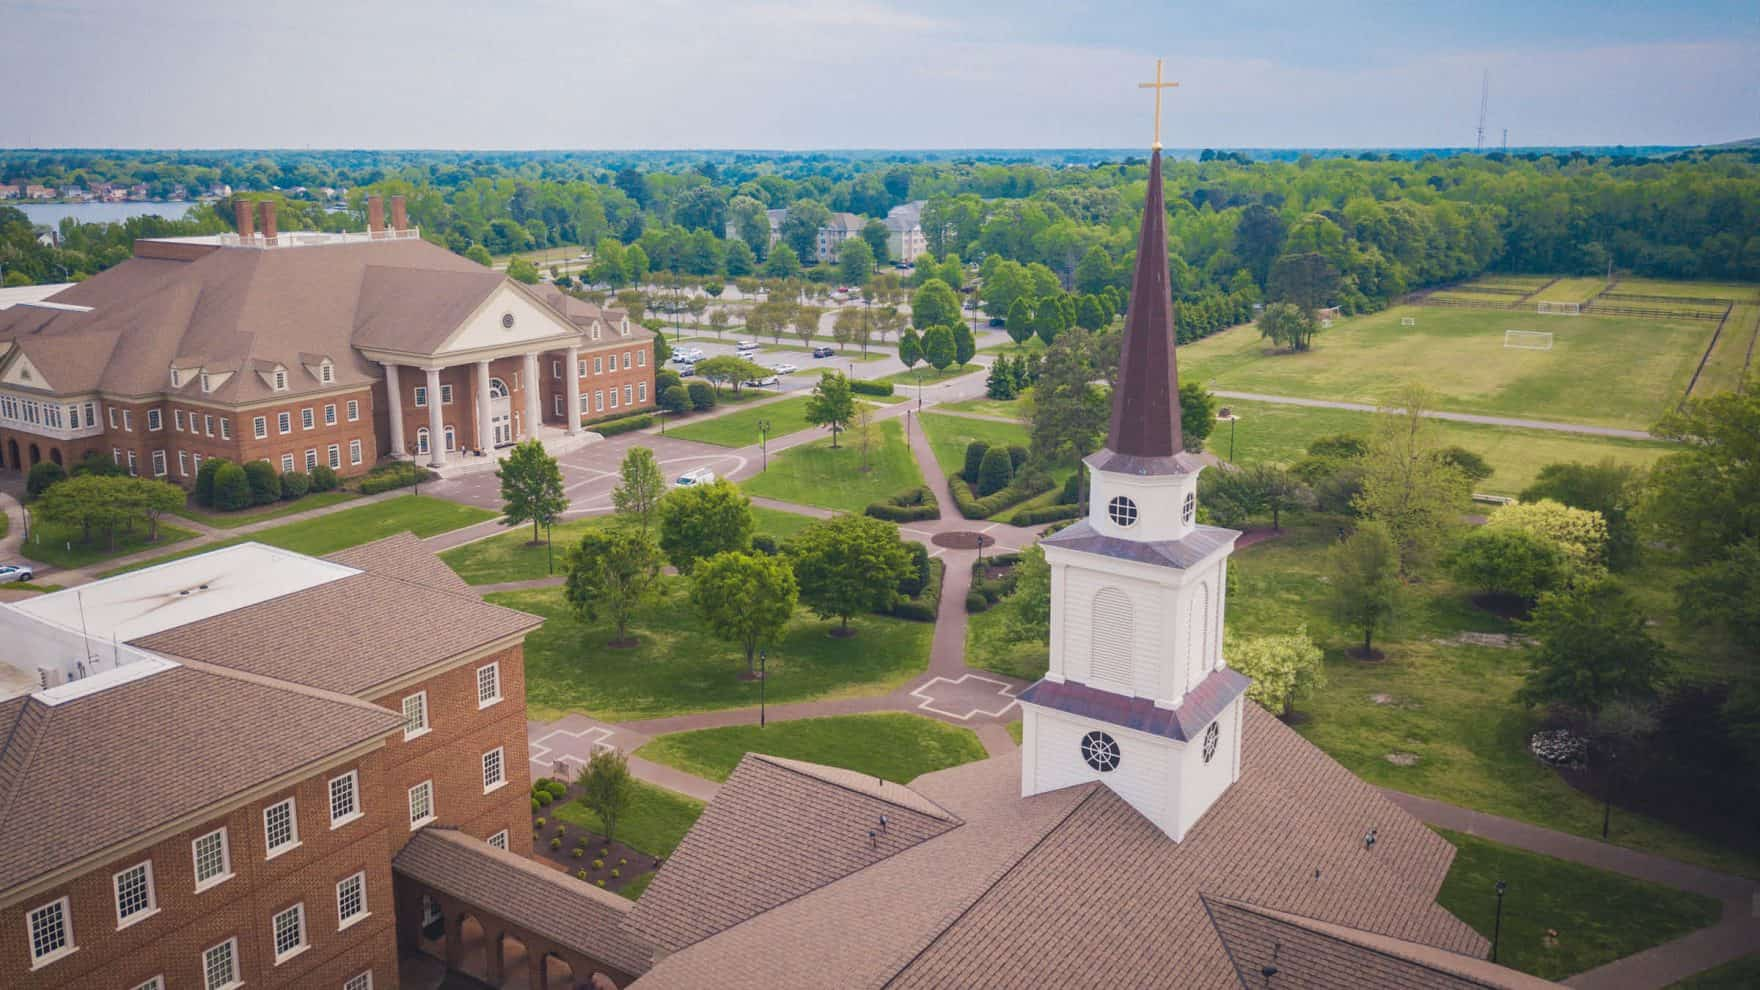 Image of Regent University chapel, $4k homeschool scholarship available